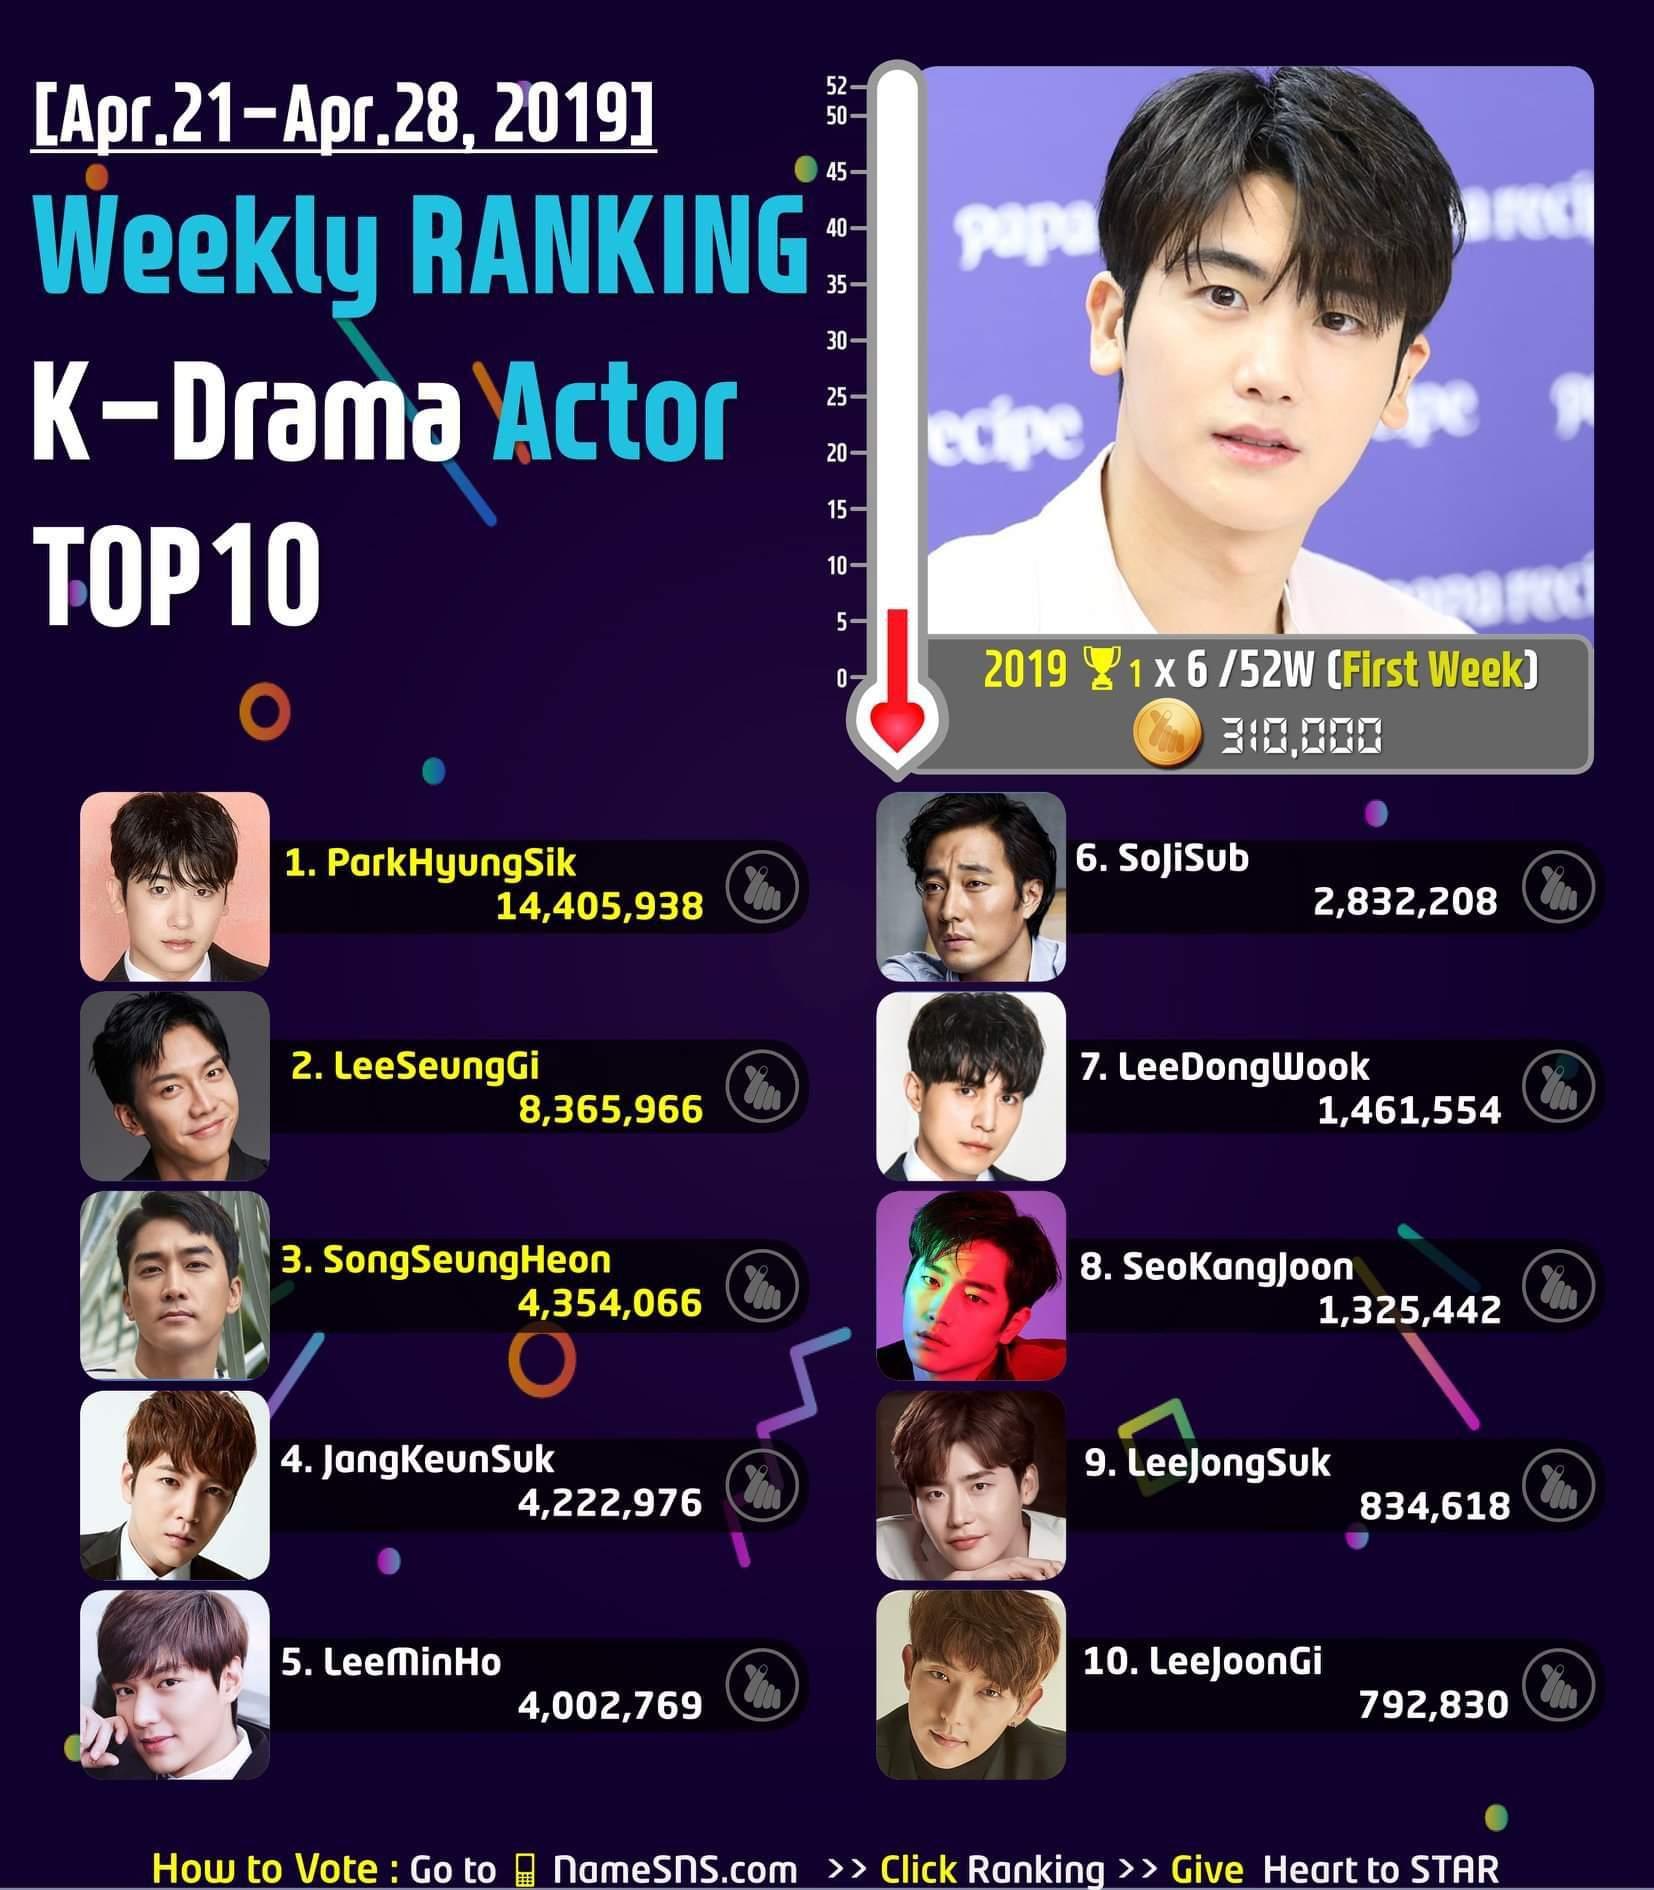 [Apr 21 - Apr 28, 2019]#Weekly #Ranking #KDrama Actor TOP